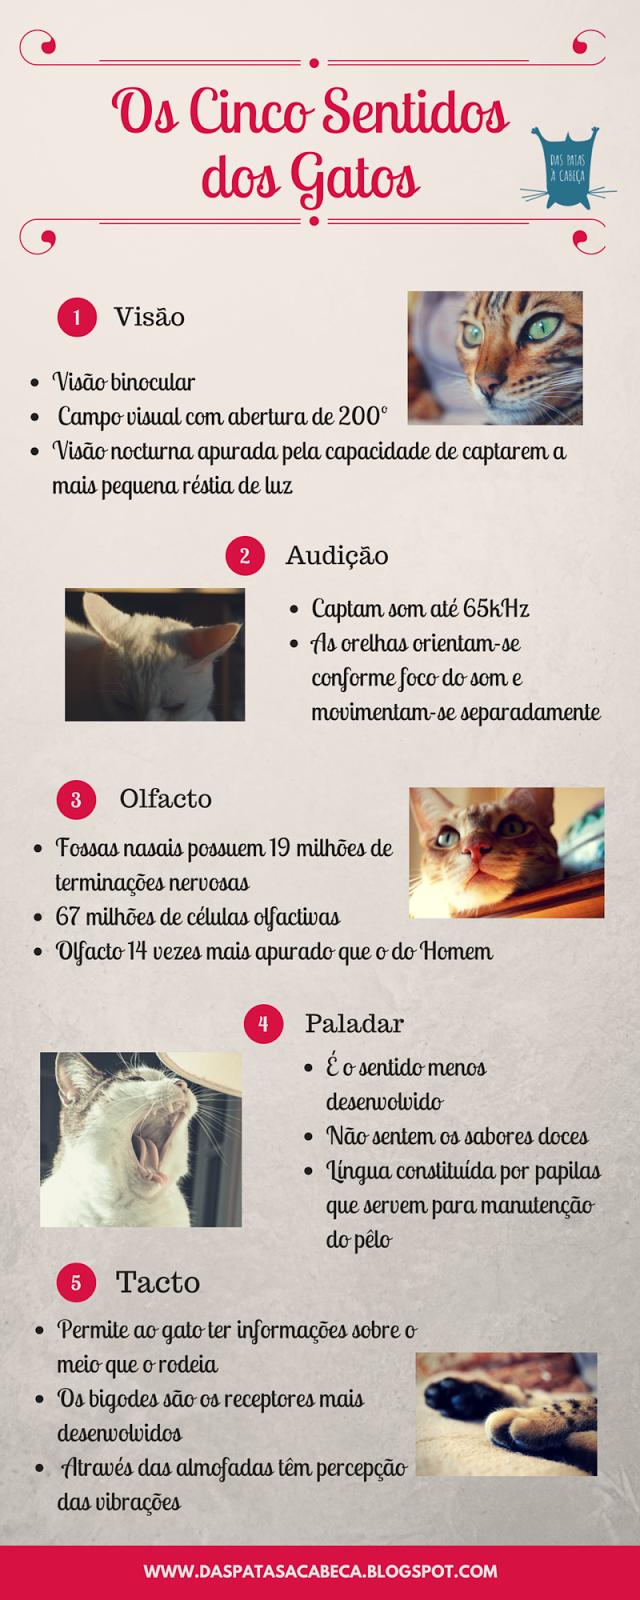 infografia sentidos gatos